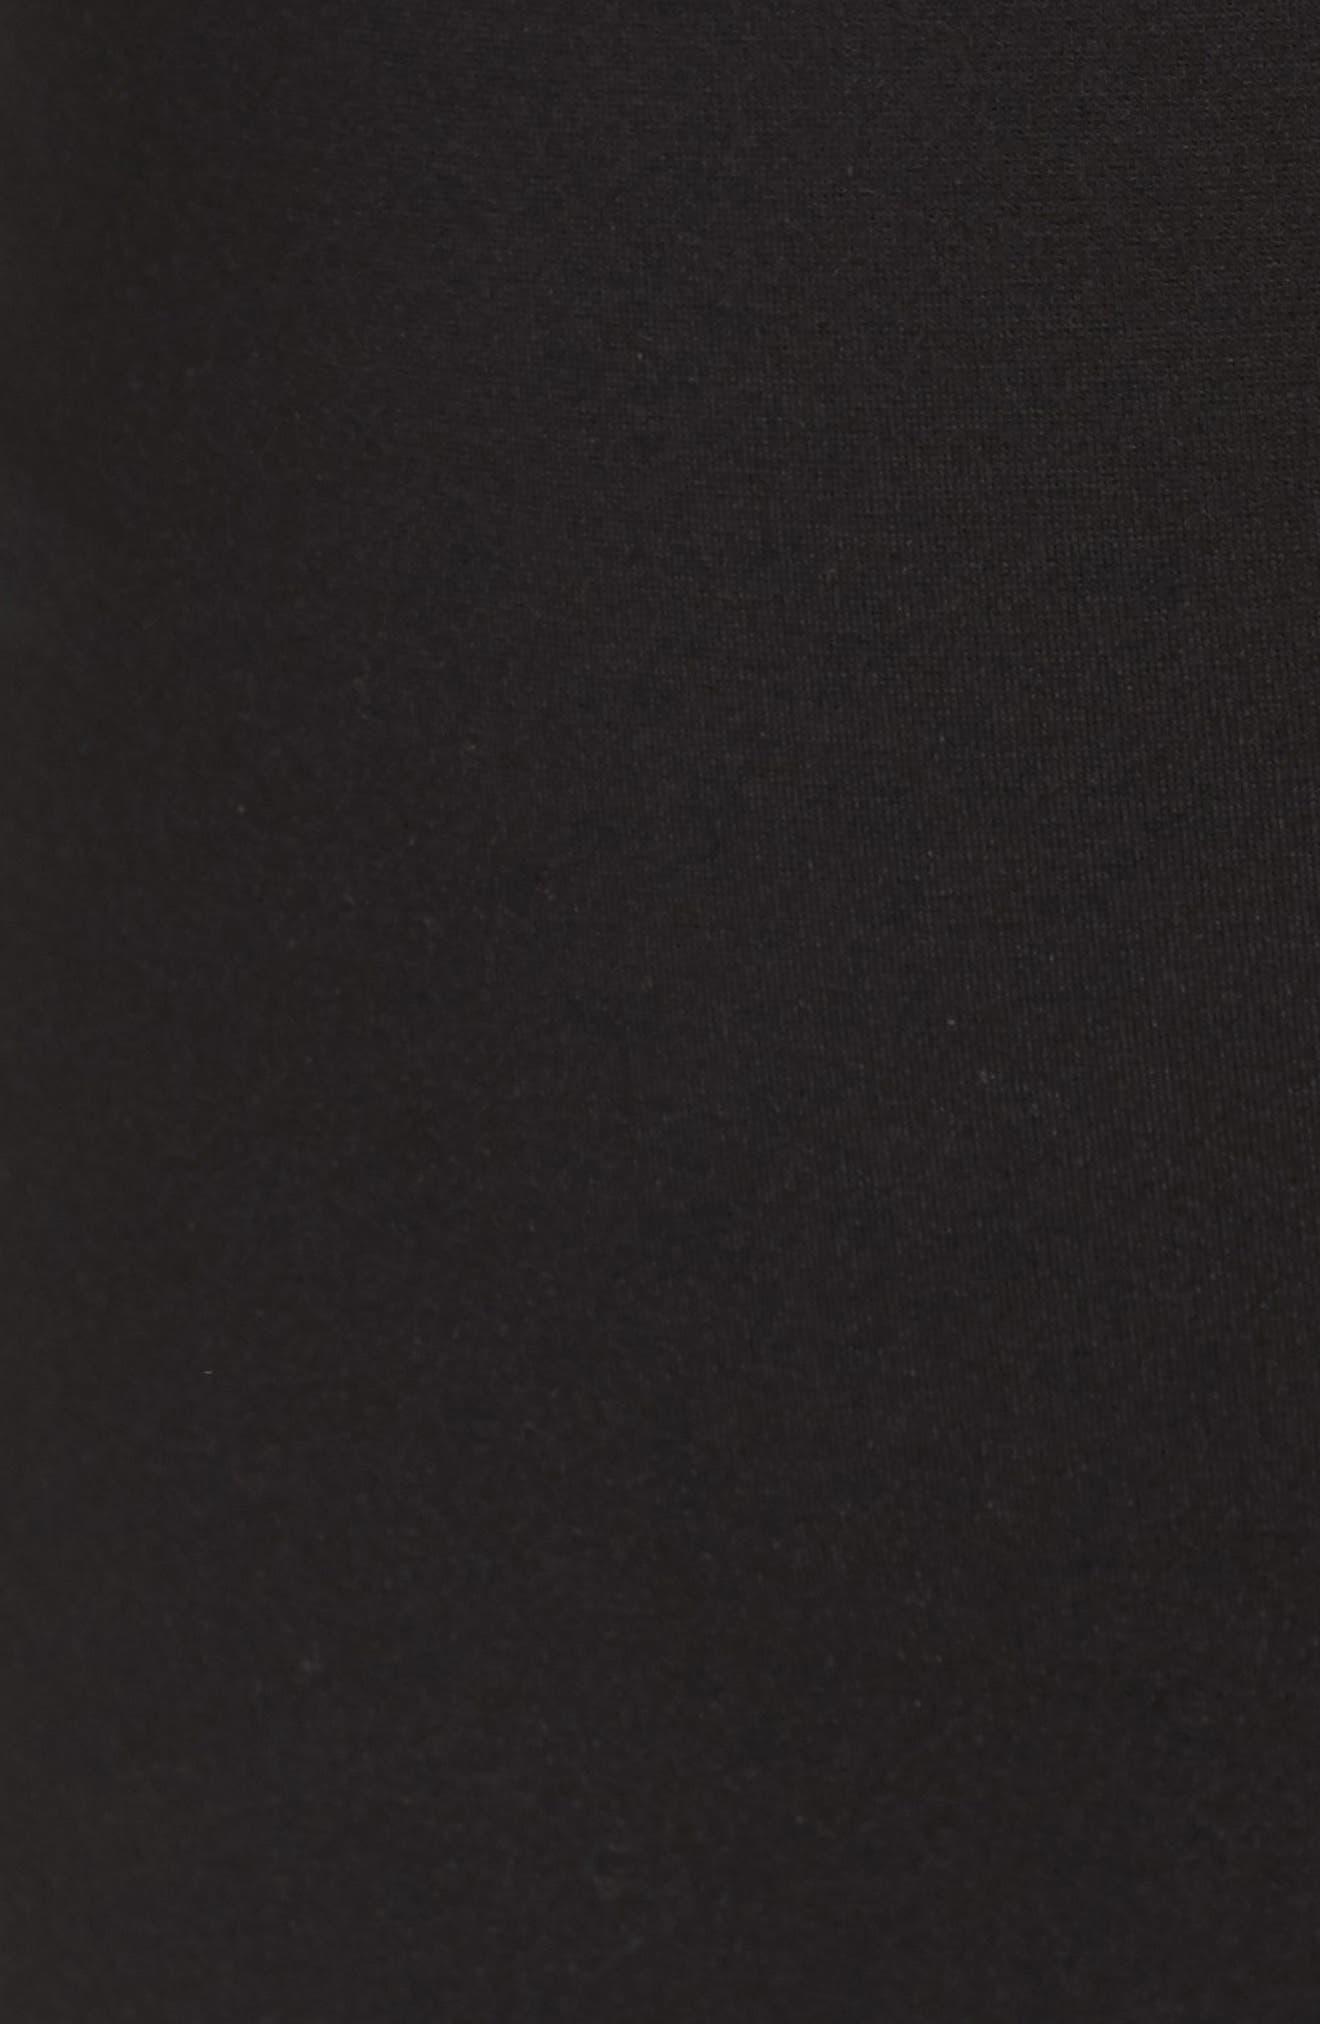 Floetry Bell Sleeve Sheath Dress,                             Alternate thumbnail 5, color,                             Cream Lace/ Black